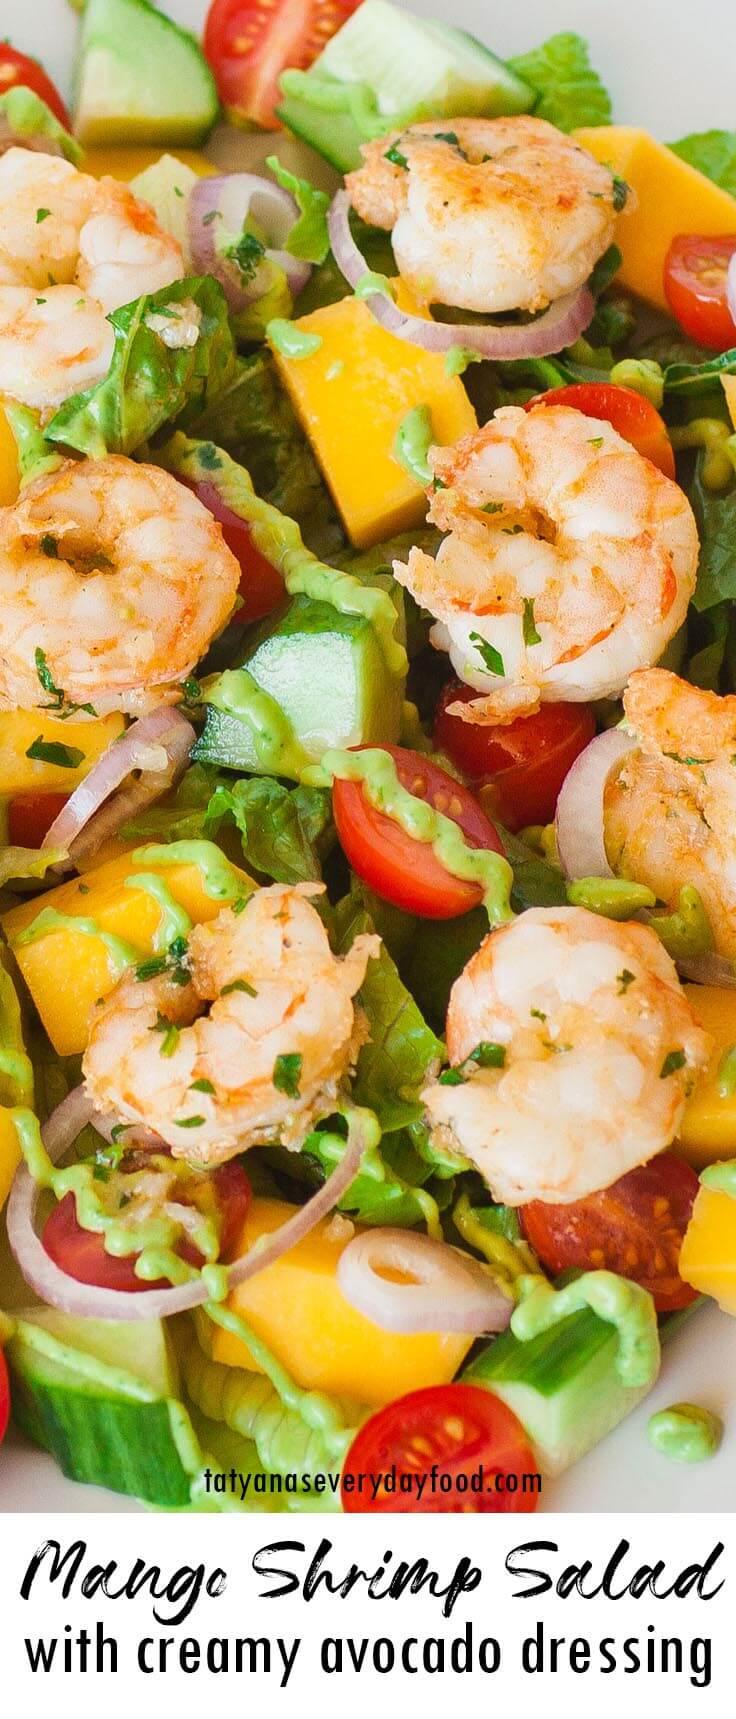 Mango Shrimp Salad video recipe